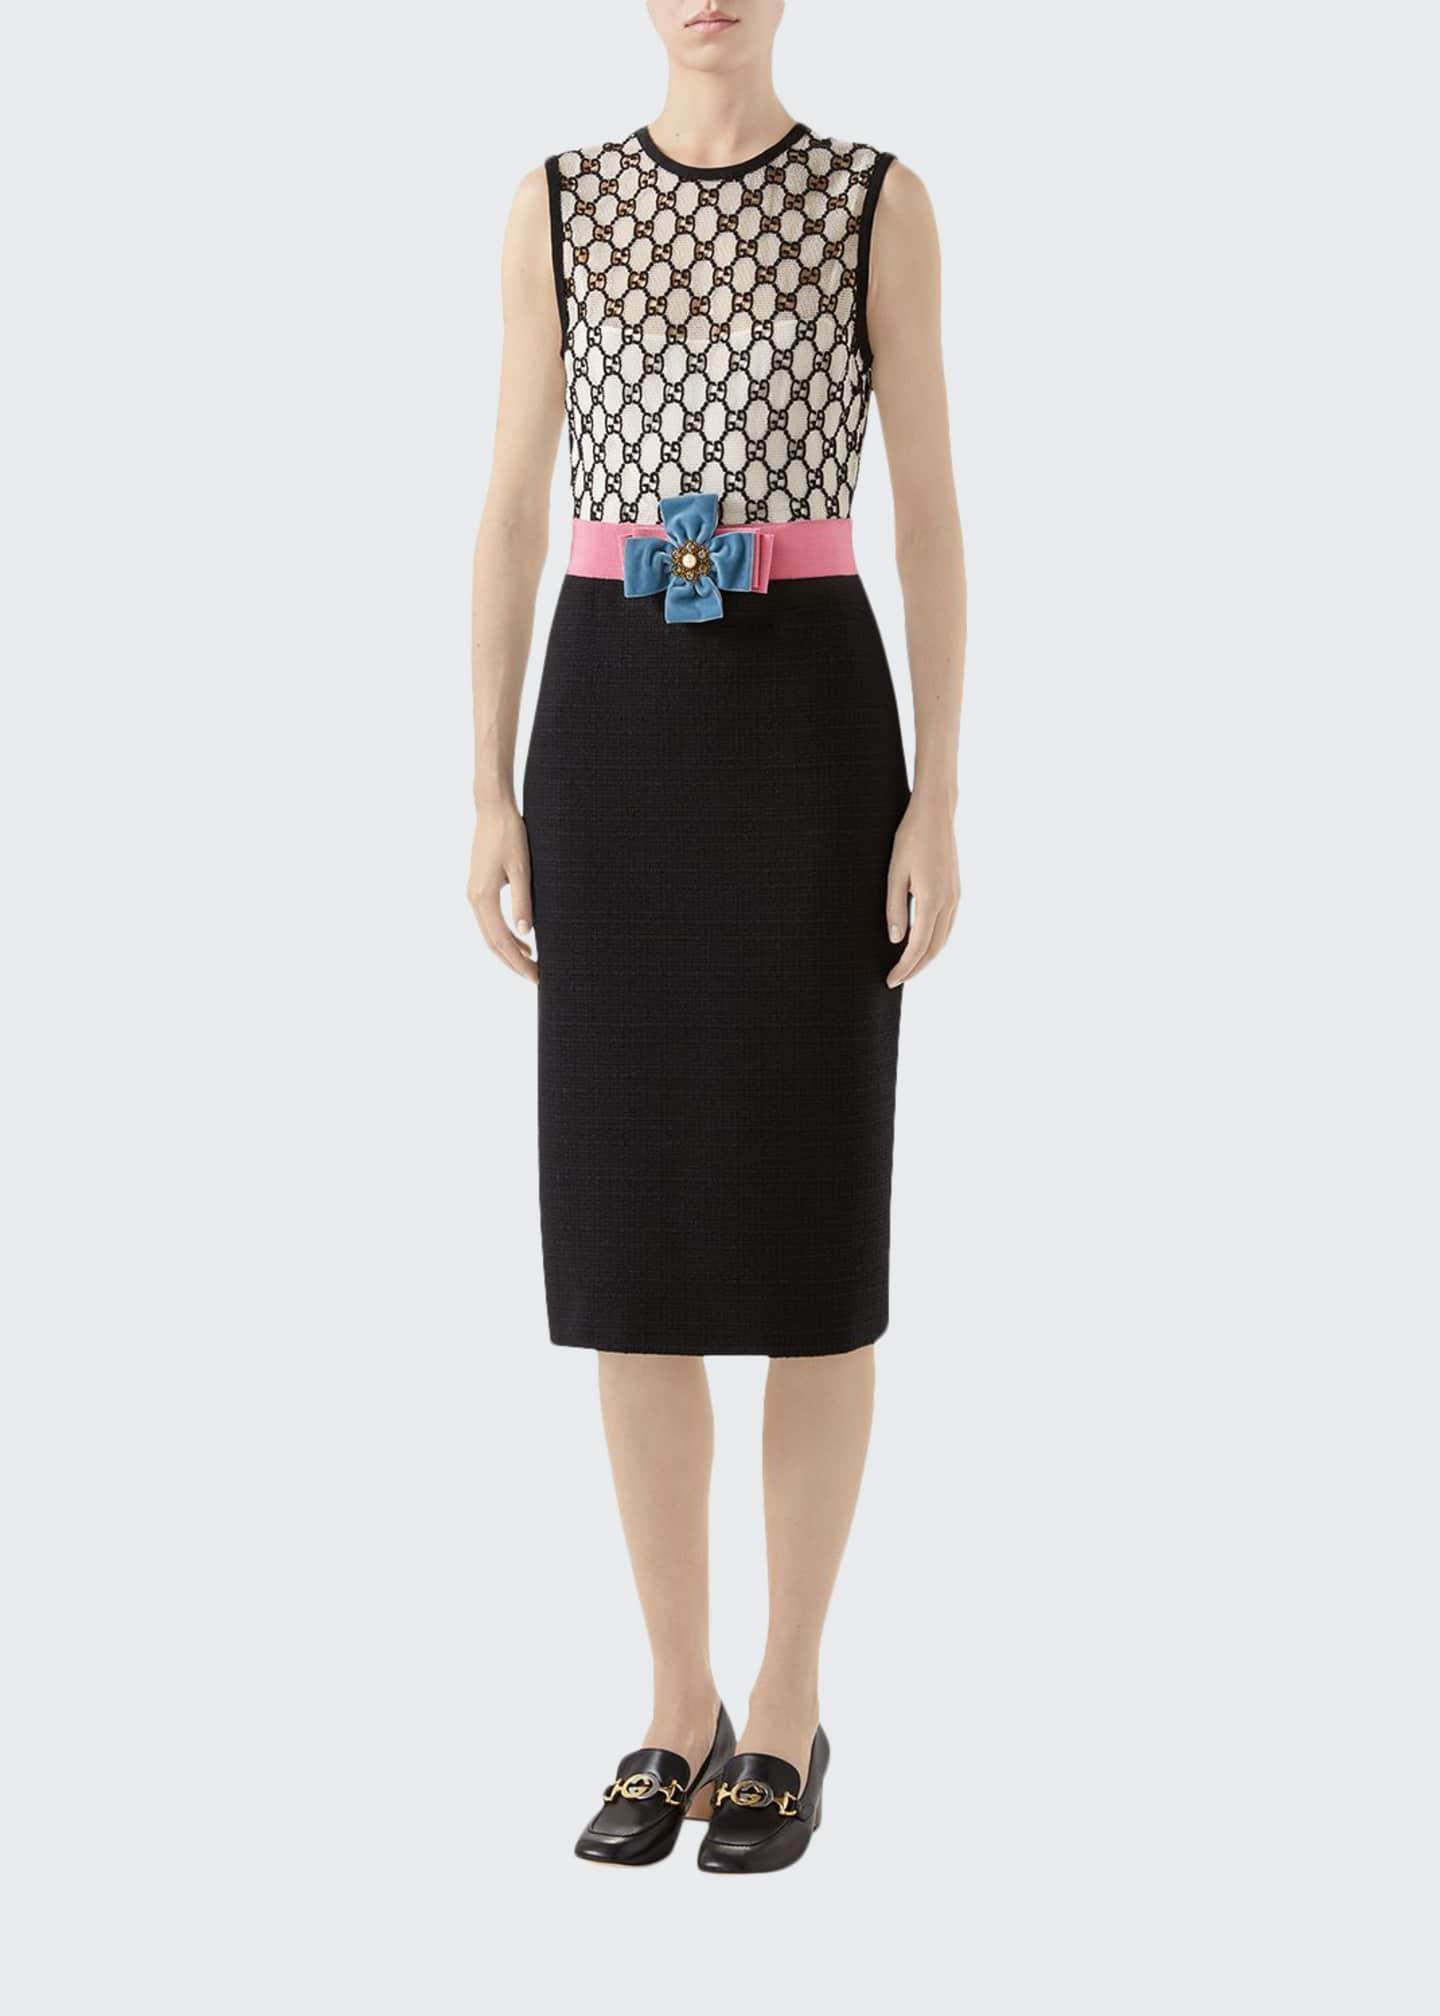 Gucci GG Macrame Tie-Waist Sheath Dress